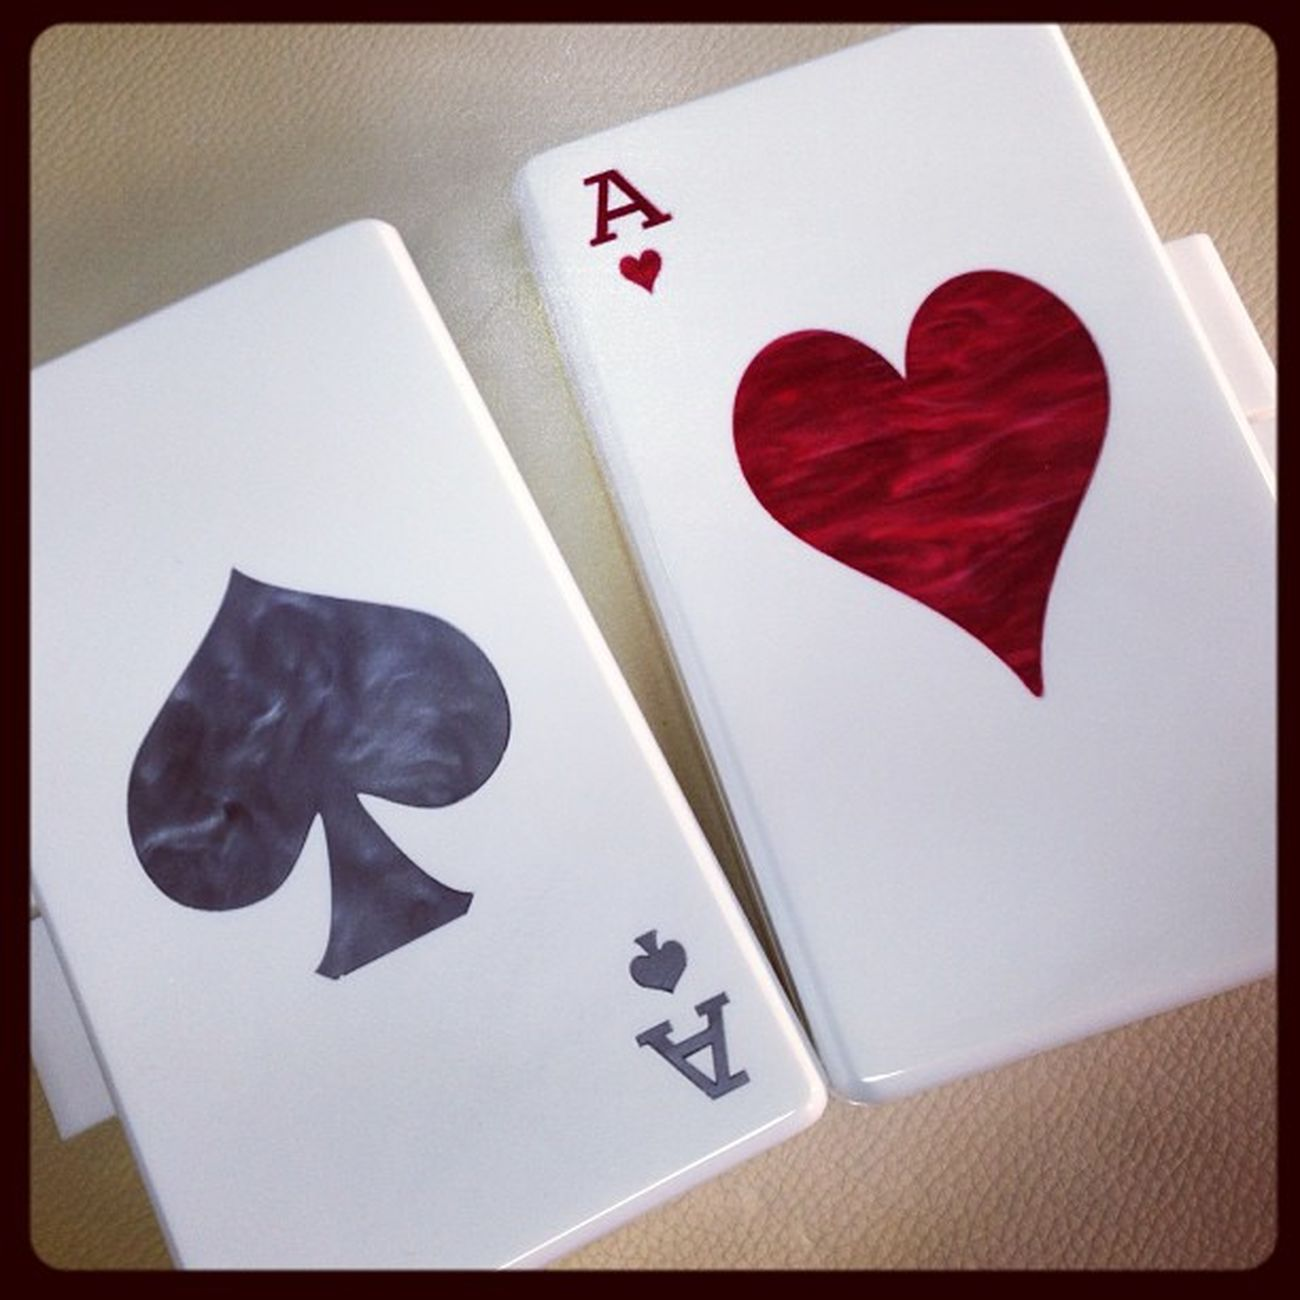 Ss13 Perspex Plexiglass Lucite cards casino blackjack queen asos design bag clutch minaudiere white red grey a uraniagazelli